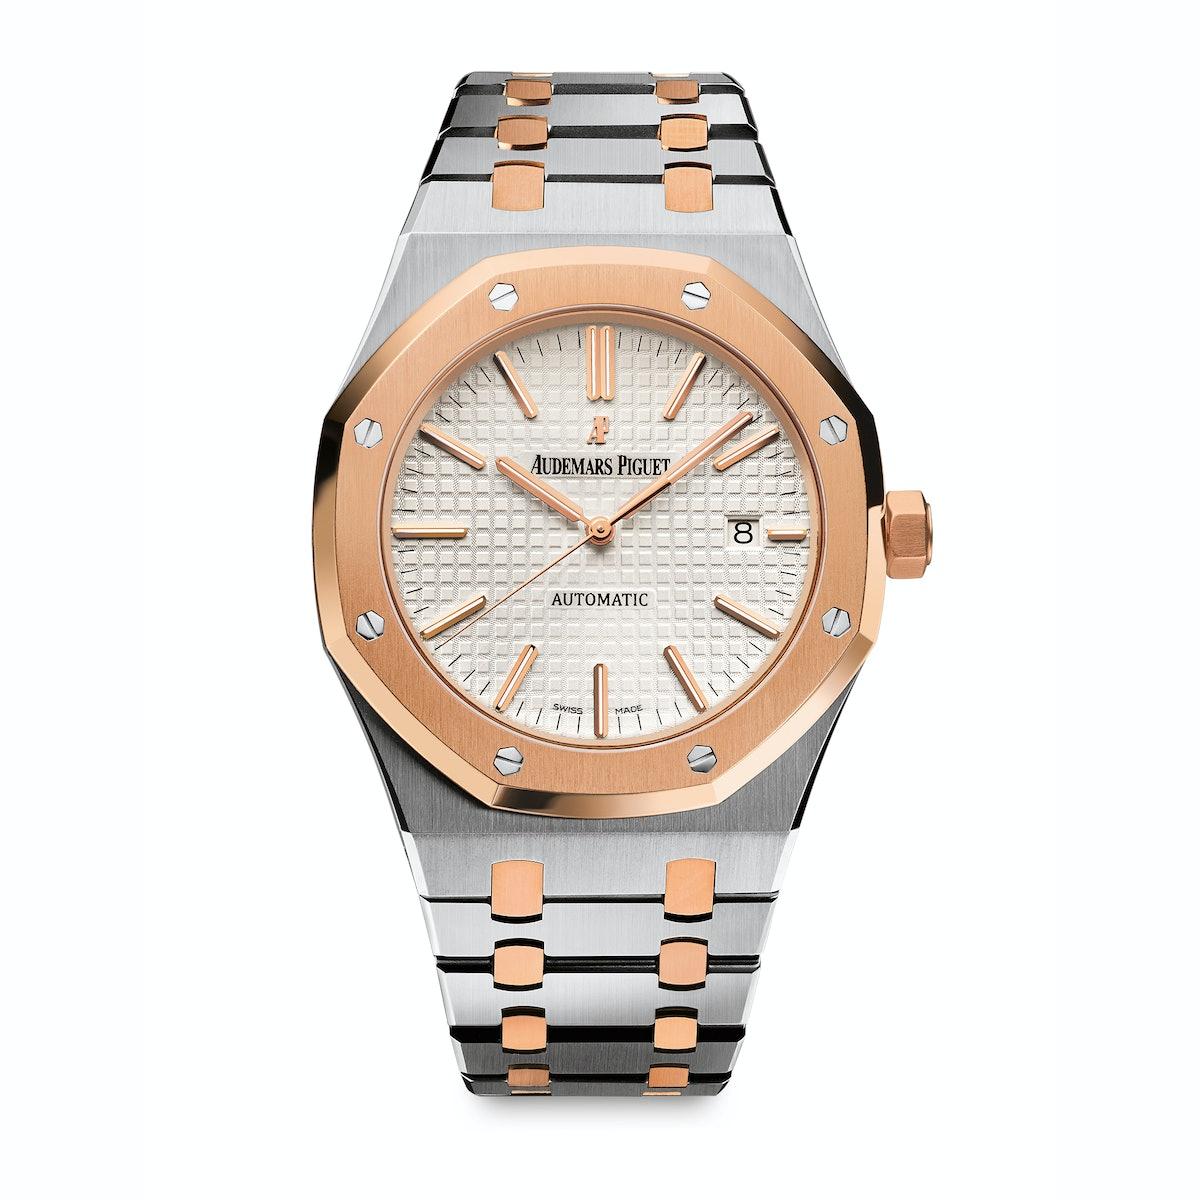 Audemars Piguet stainless steel and gold watch